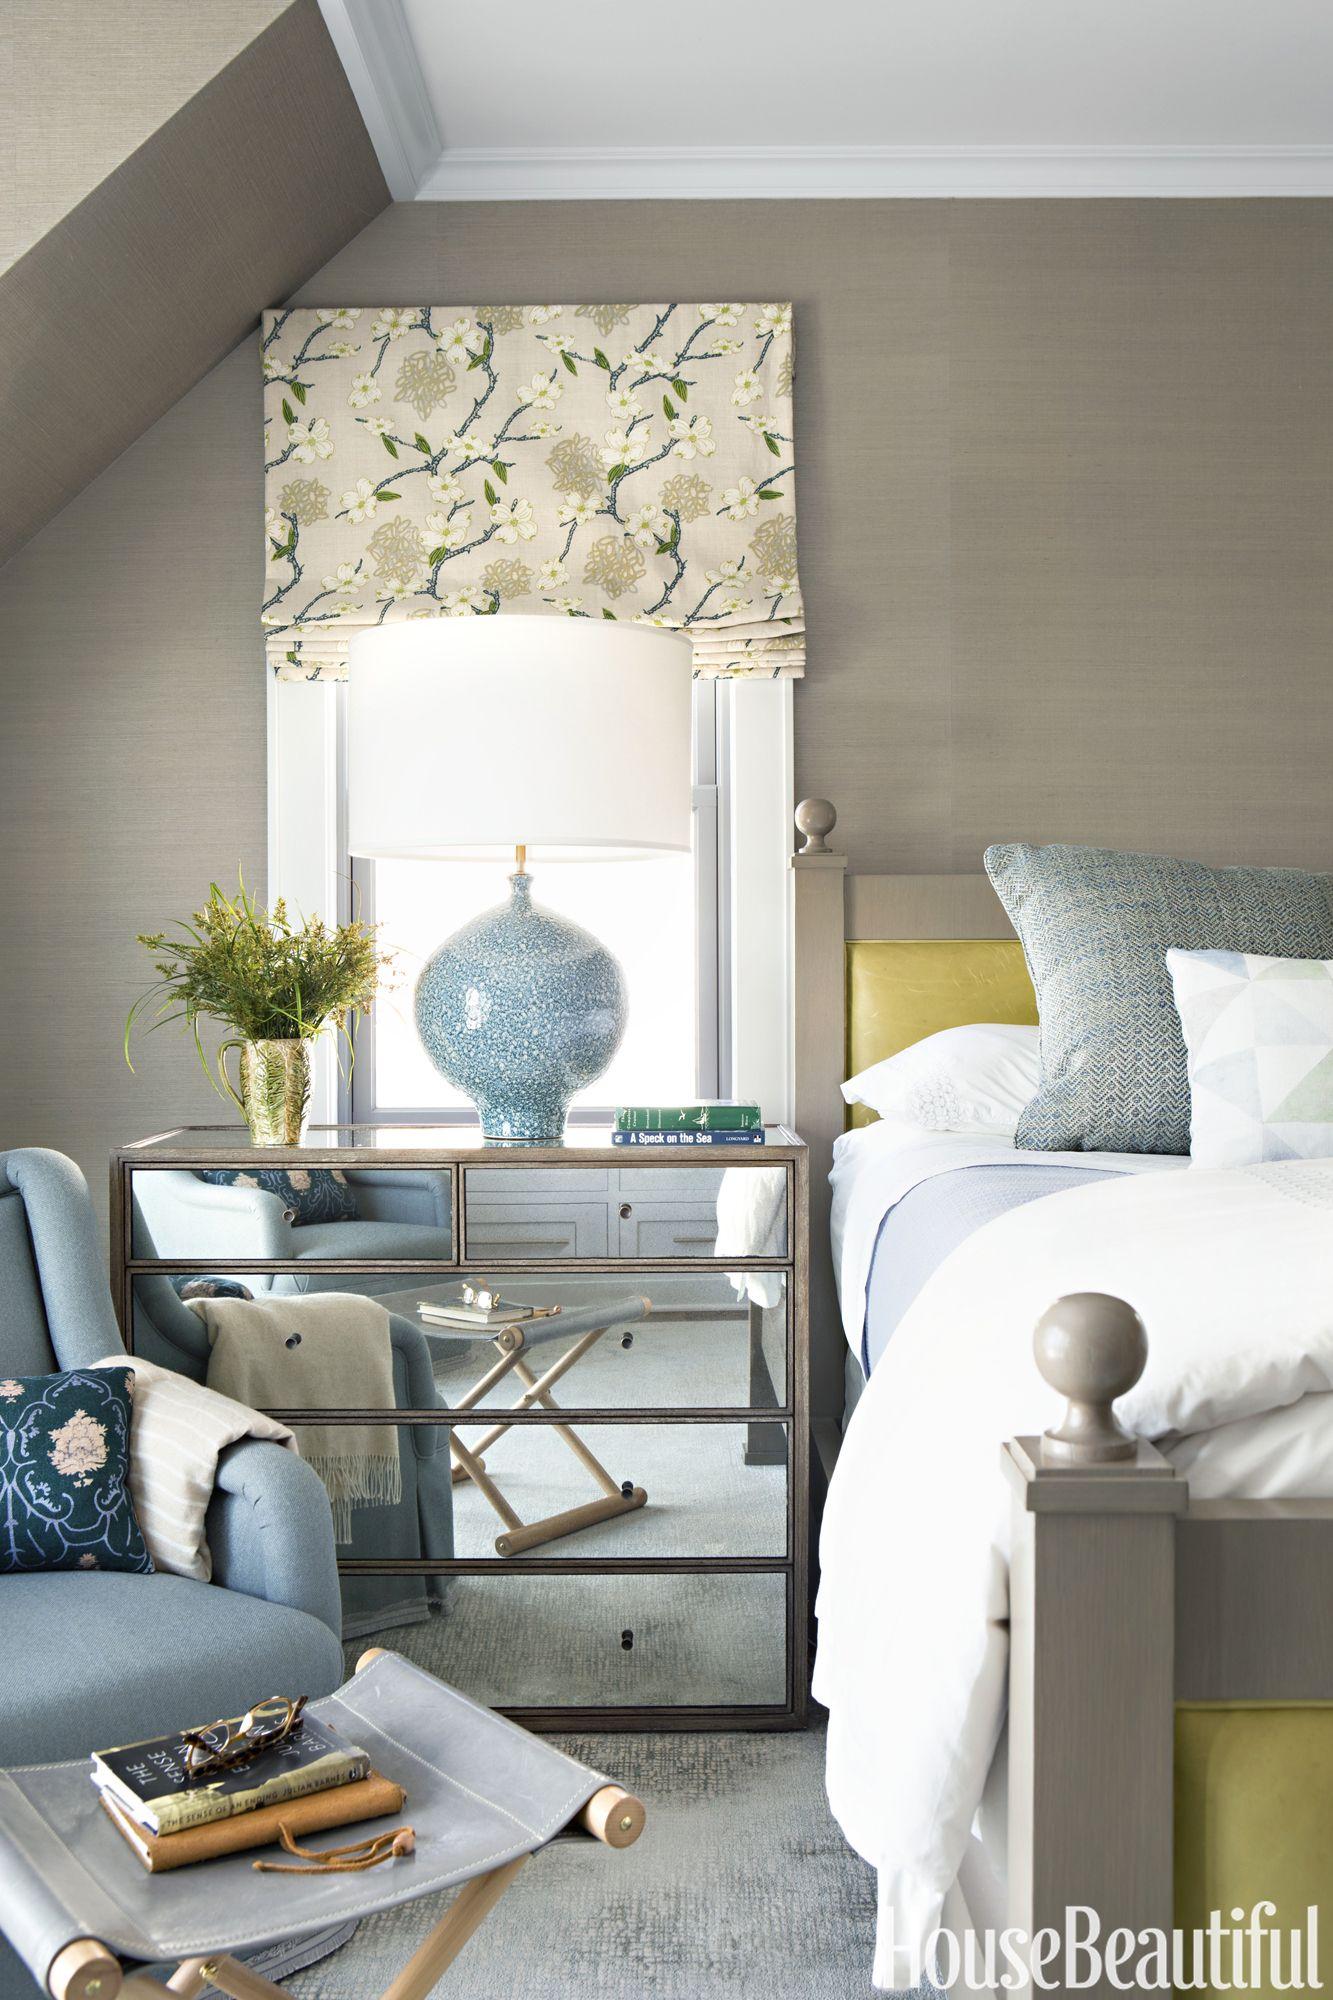 & 34 Best Window Treatment Ideas - Modern Curtains Blinds u0026 Coverings